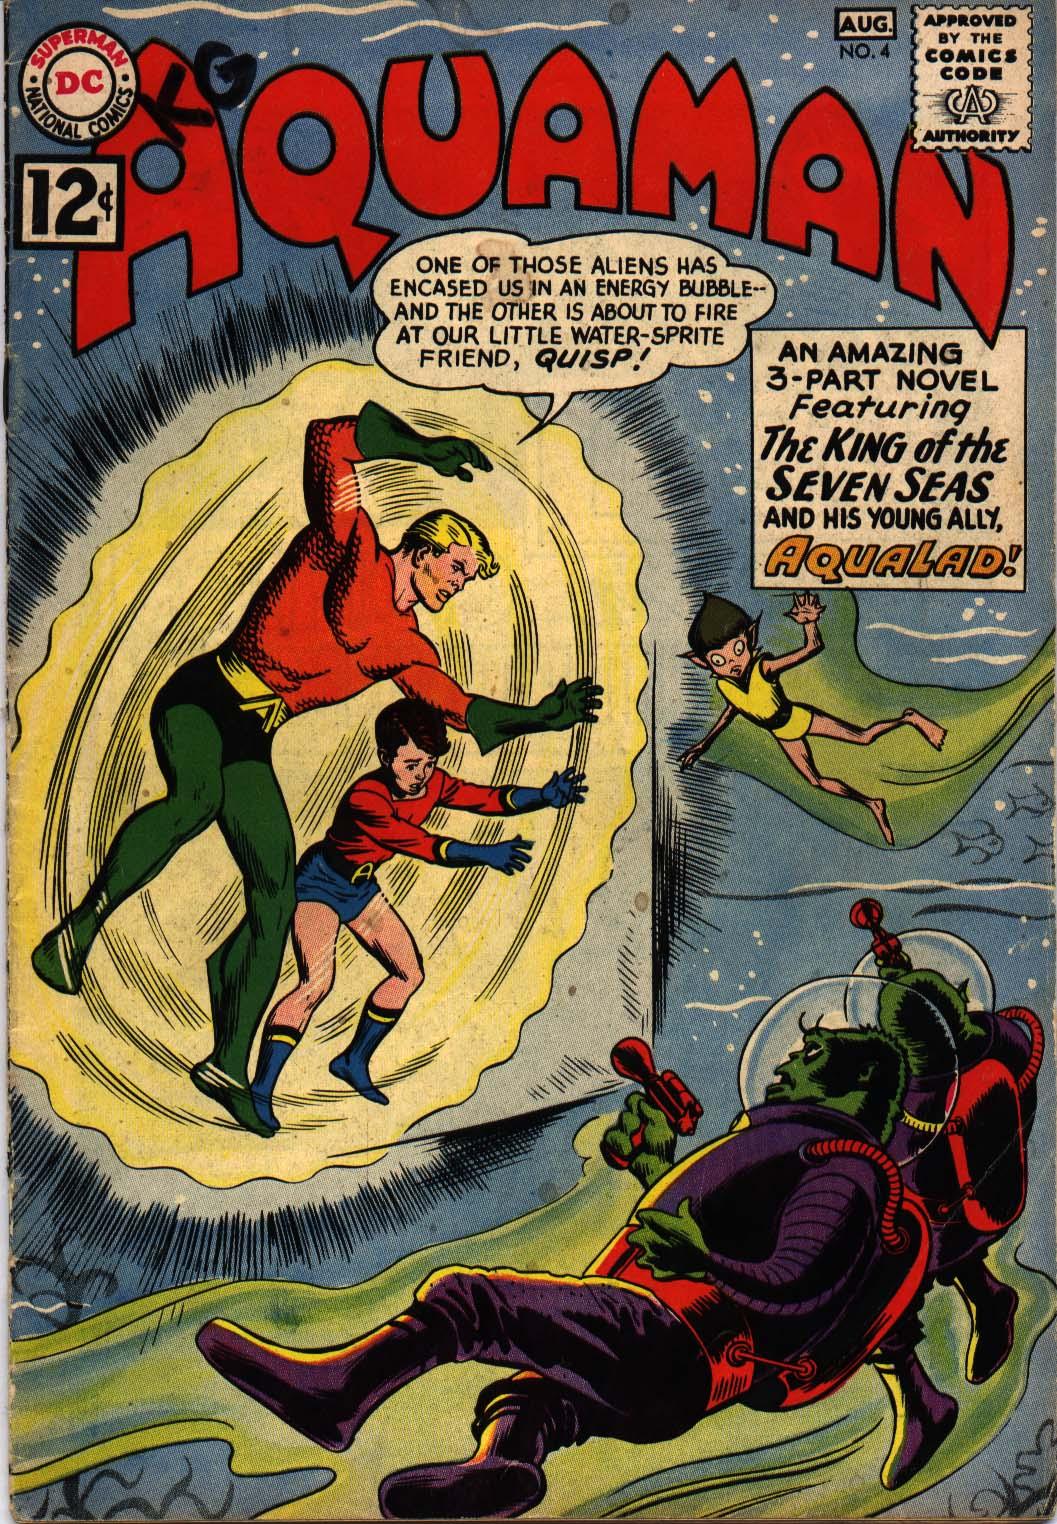 Read online Aquaman (1962) comic -  Issue #4 - 1